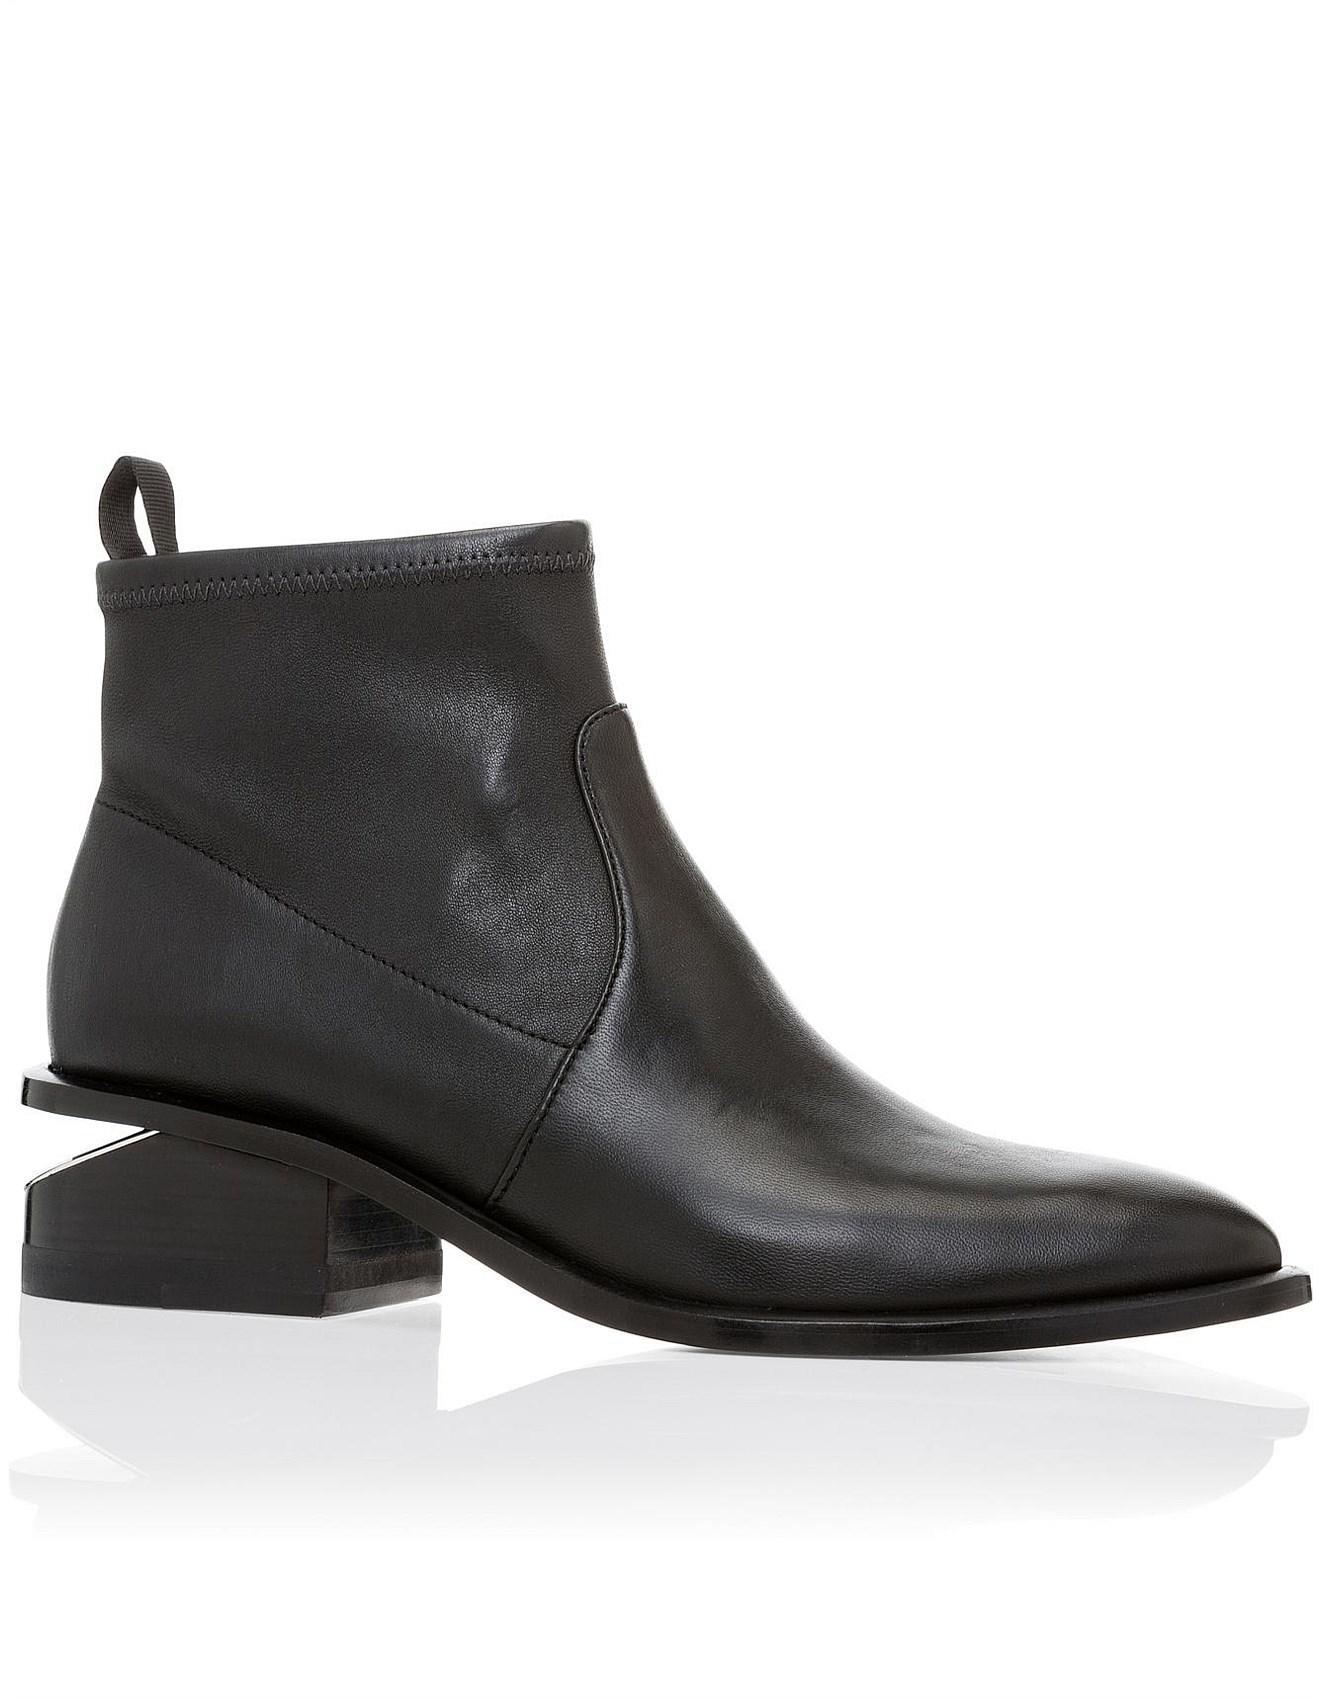 6479ffa914763 Women's Shoes | Buy Shoes Online | David Jones - KORI STRETCH BOOTIE ...